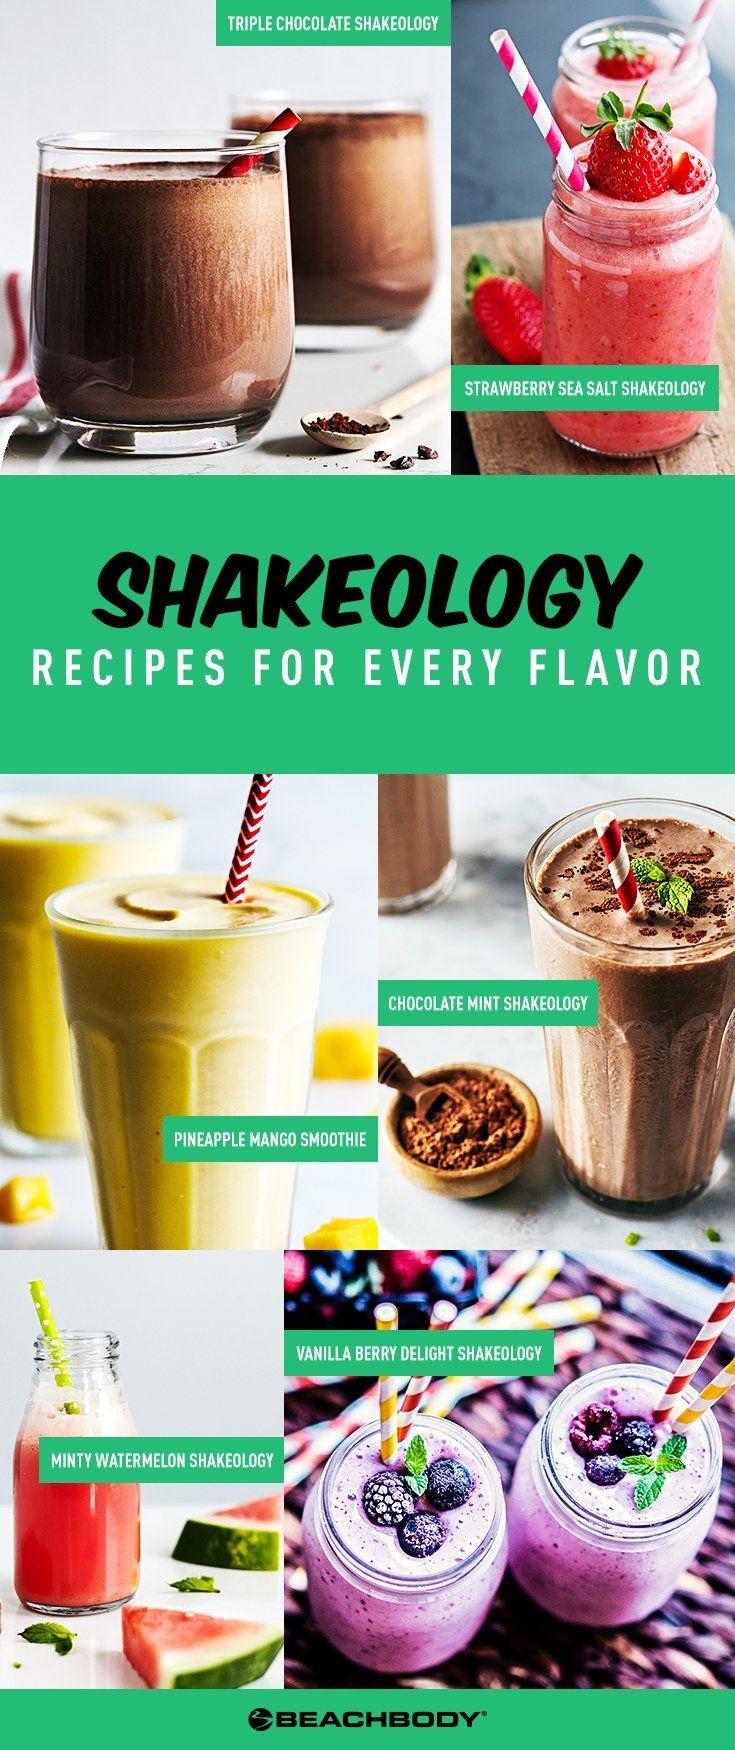 Shakeology Recipes for Every Shakeology Flavor // best Shakeology recipes // 21 Day Fix // Healthy snack recipes // healthy smoothie recipes // vegan recipes// Beachbody // Beachbody Blog // #21dayfix #shakeology #21dayfix #smoothierecipes